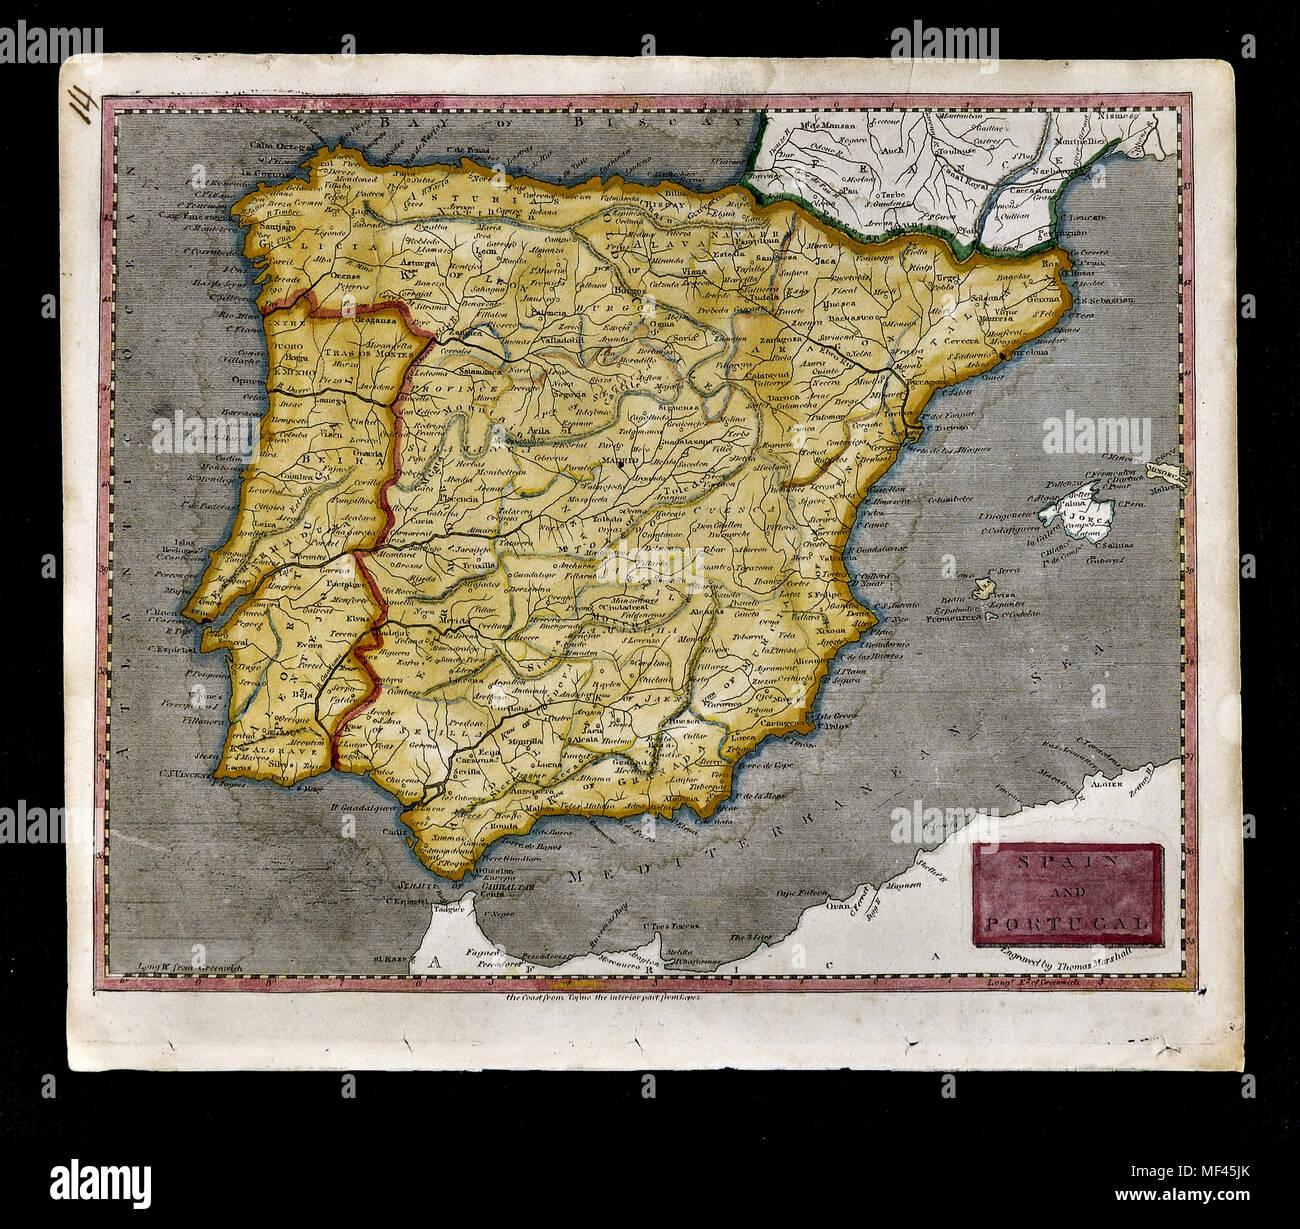 Cartina Geografica Algarve.1804 Arrowsmith Mappa Spagna E Portogallo Lisbona Lisboa Braga Porto Oporto Algarve Madrid Barcellona Cadice Toledo Europa Foto Stock Alamy